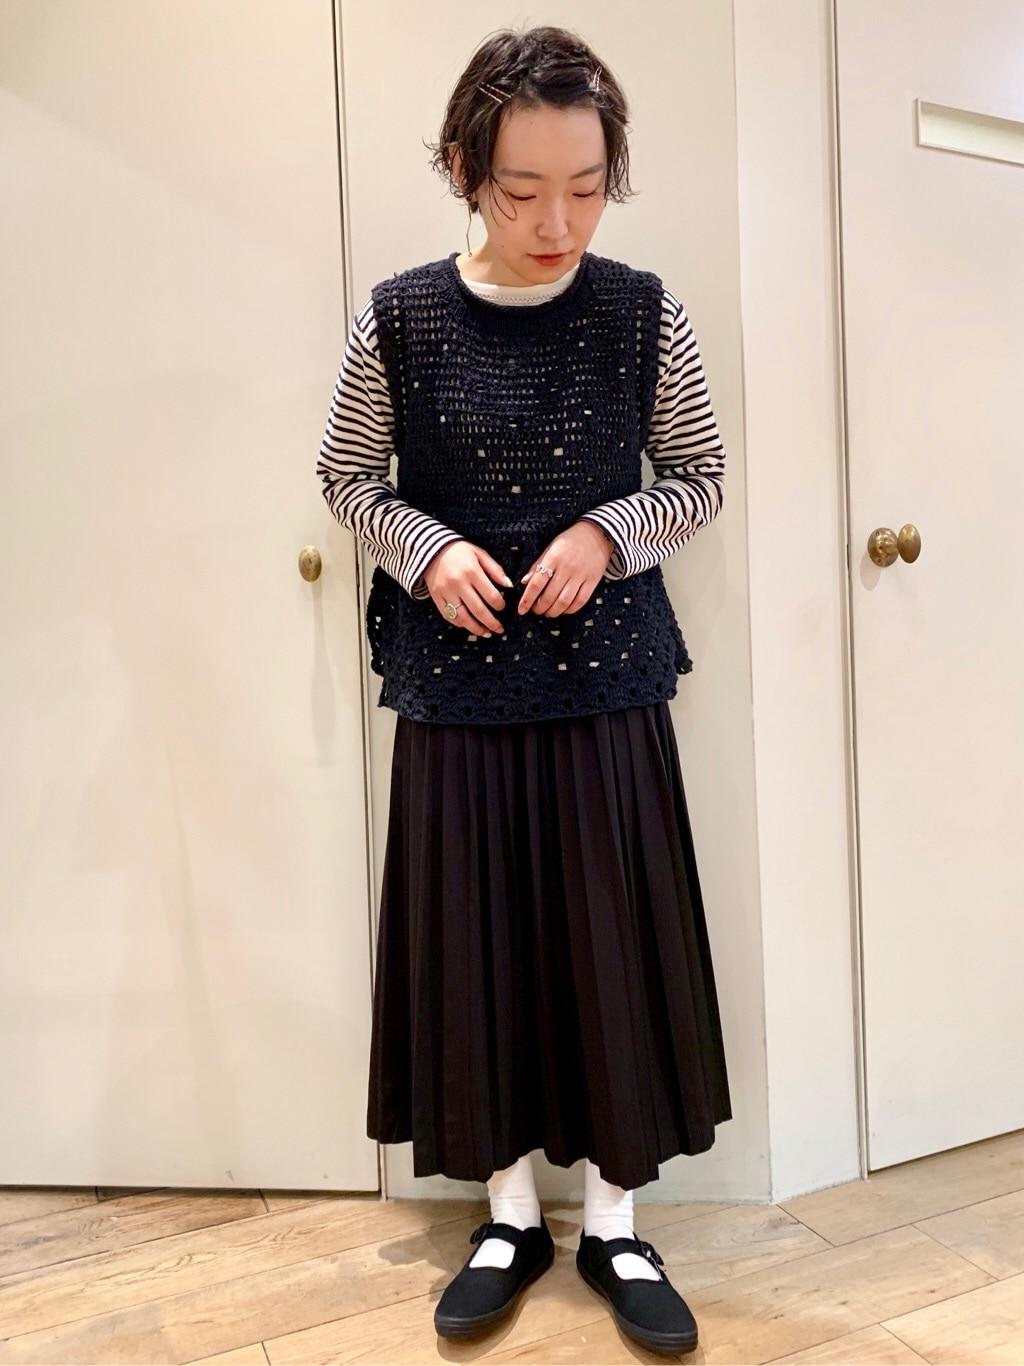 bulle de savon 新宿ミロード 身長:159cm 2020.03.02